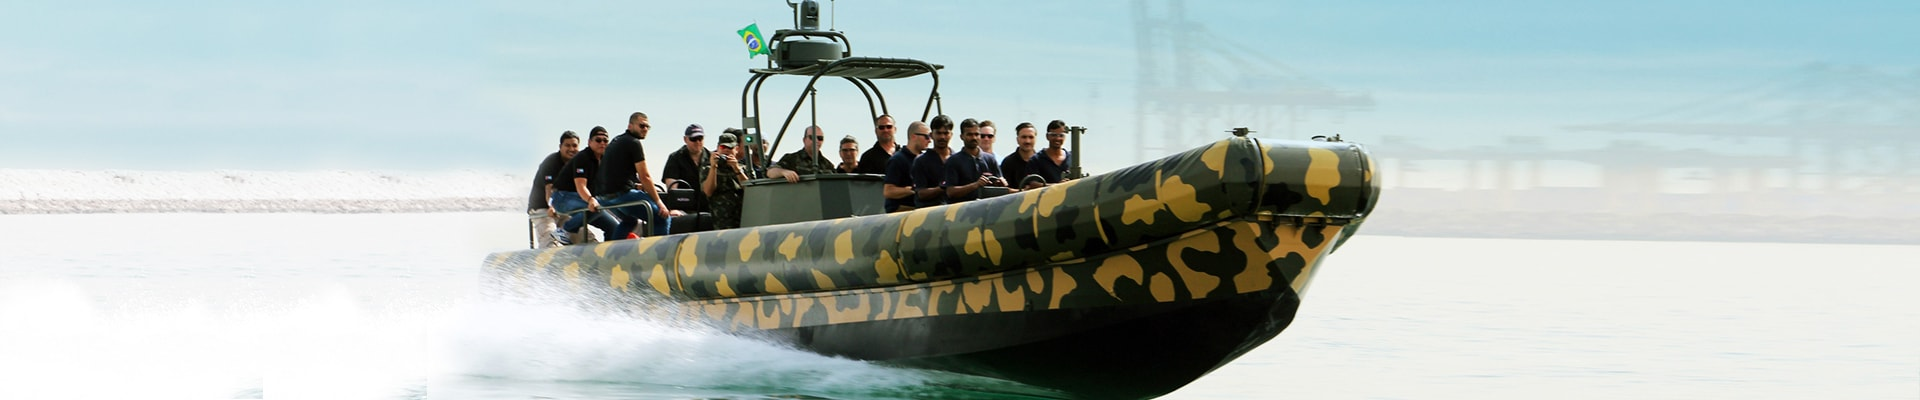 Military-Boats-Riverine-12.5-m